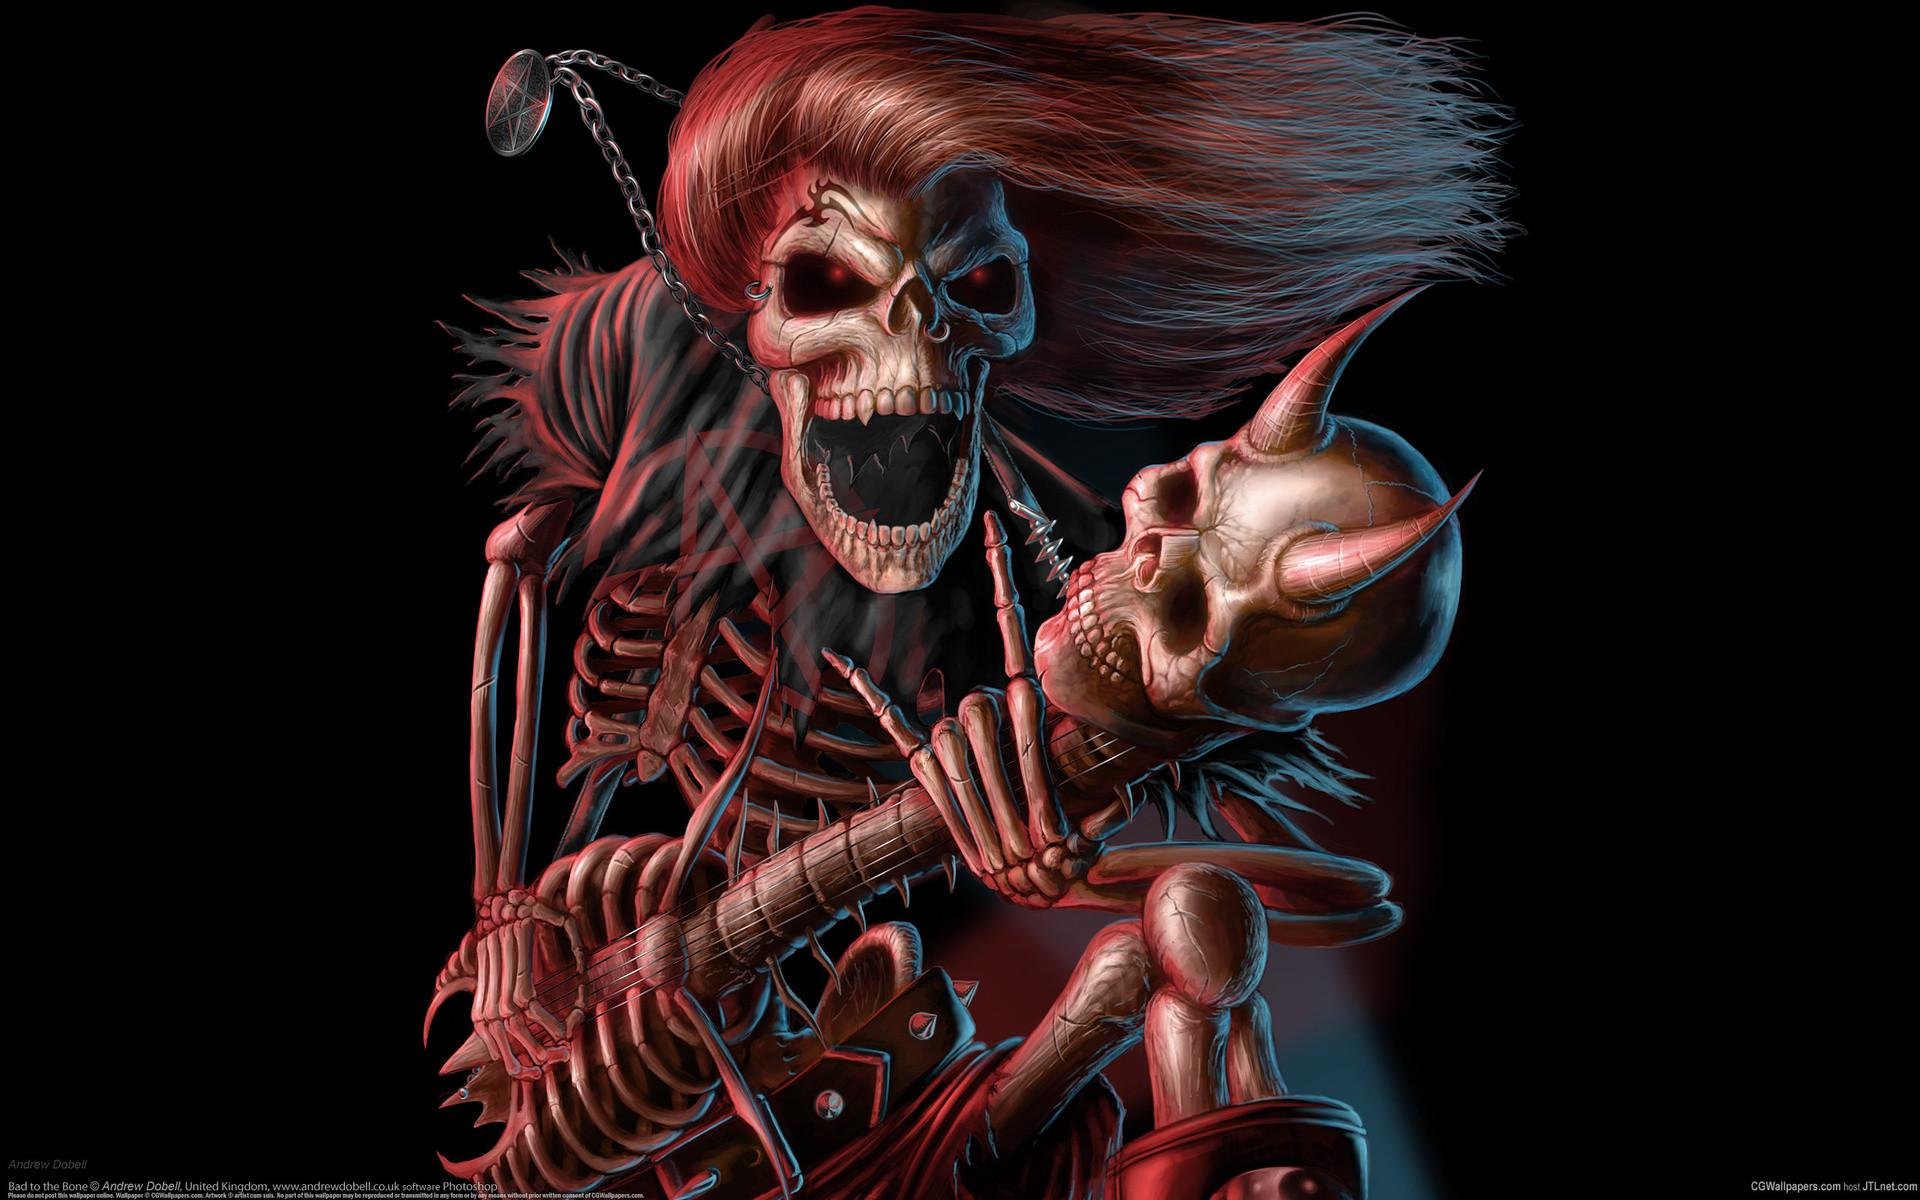 Halloween Skeleton Wallpaper.Scary Skeleton Wallpaper 66 Images